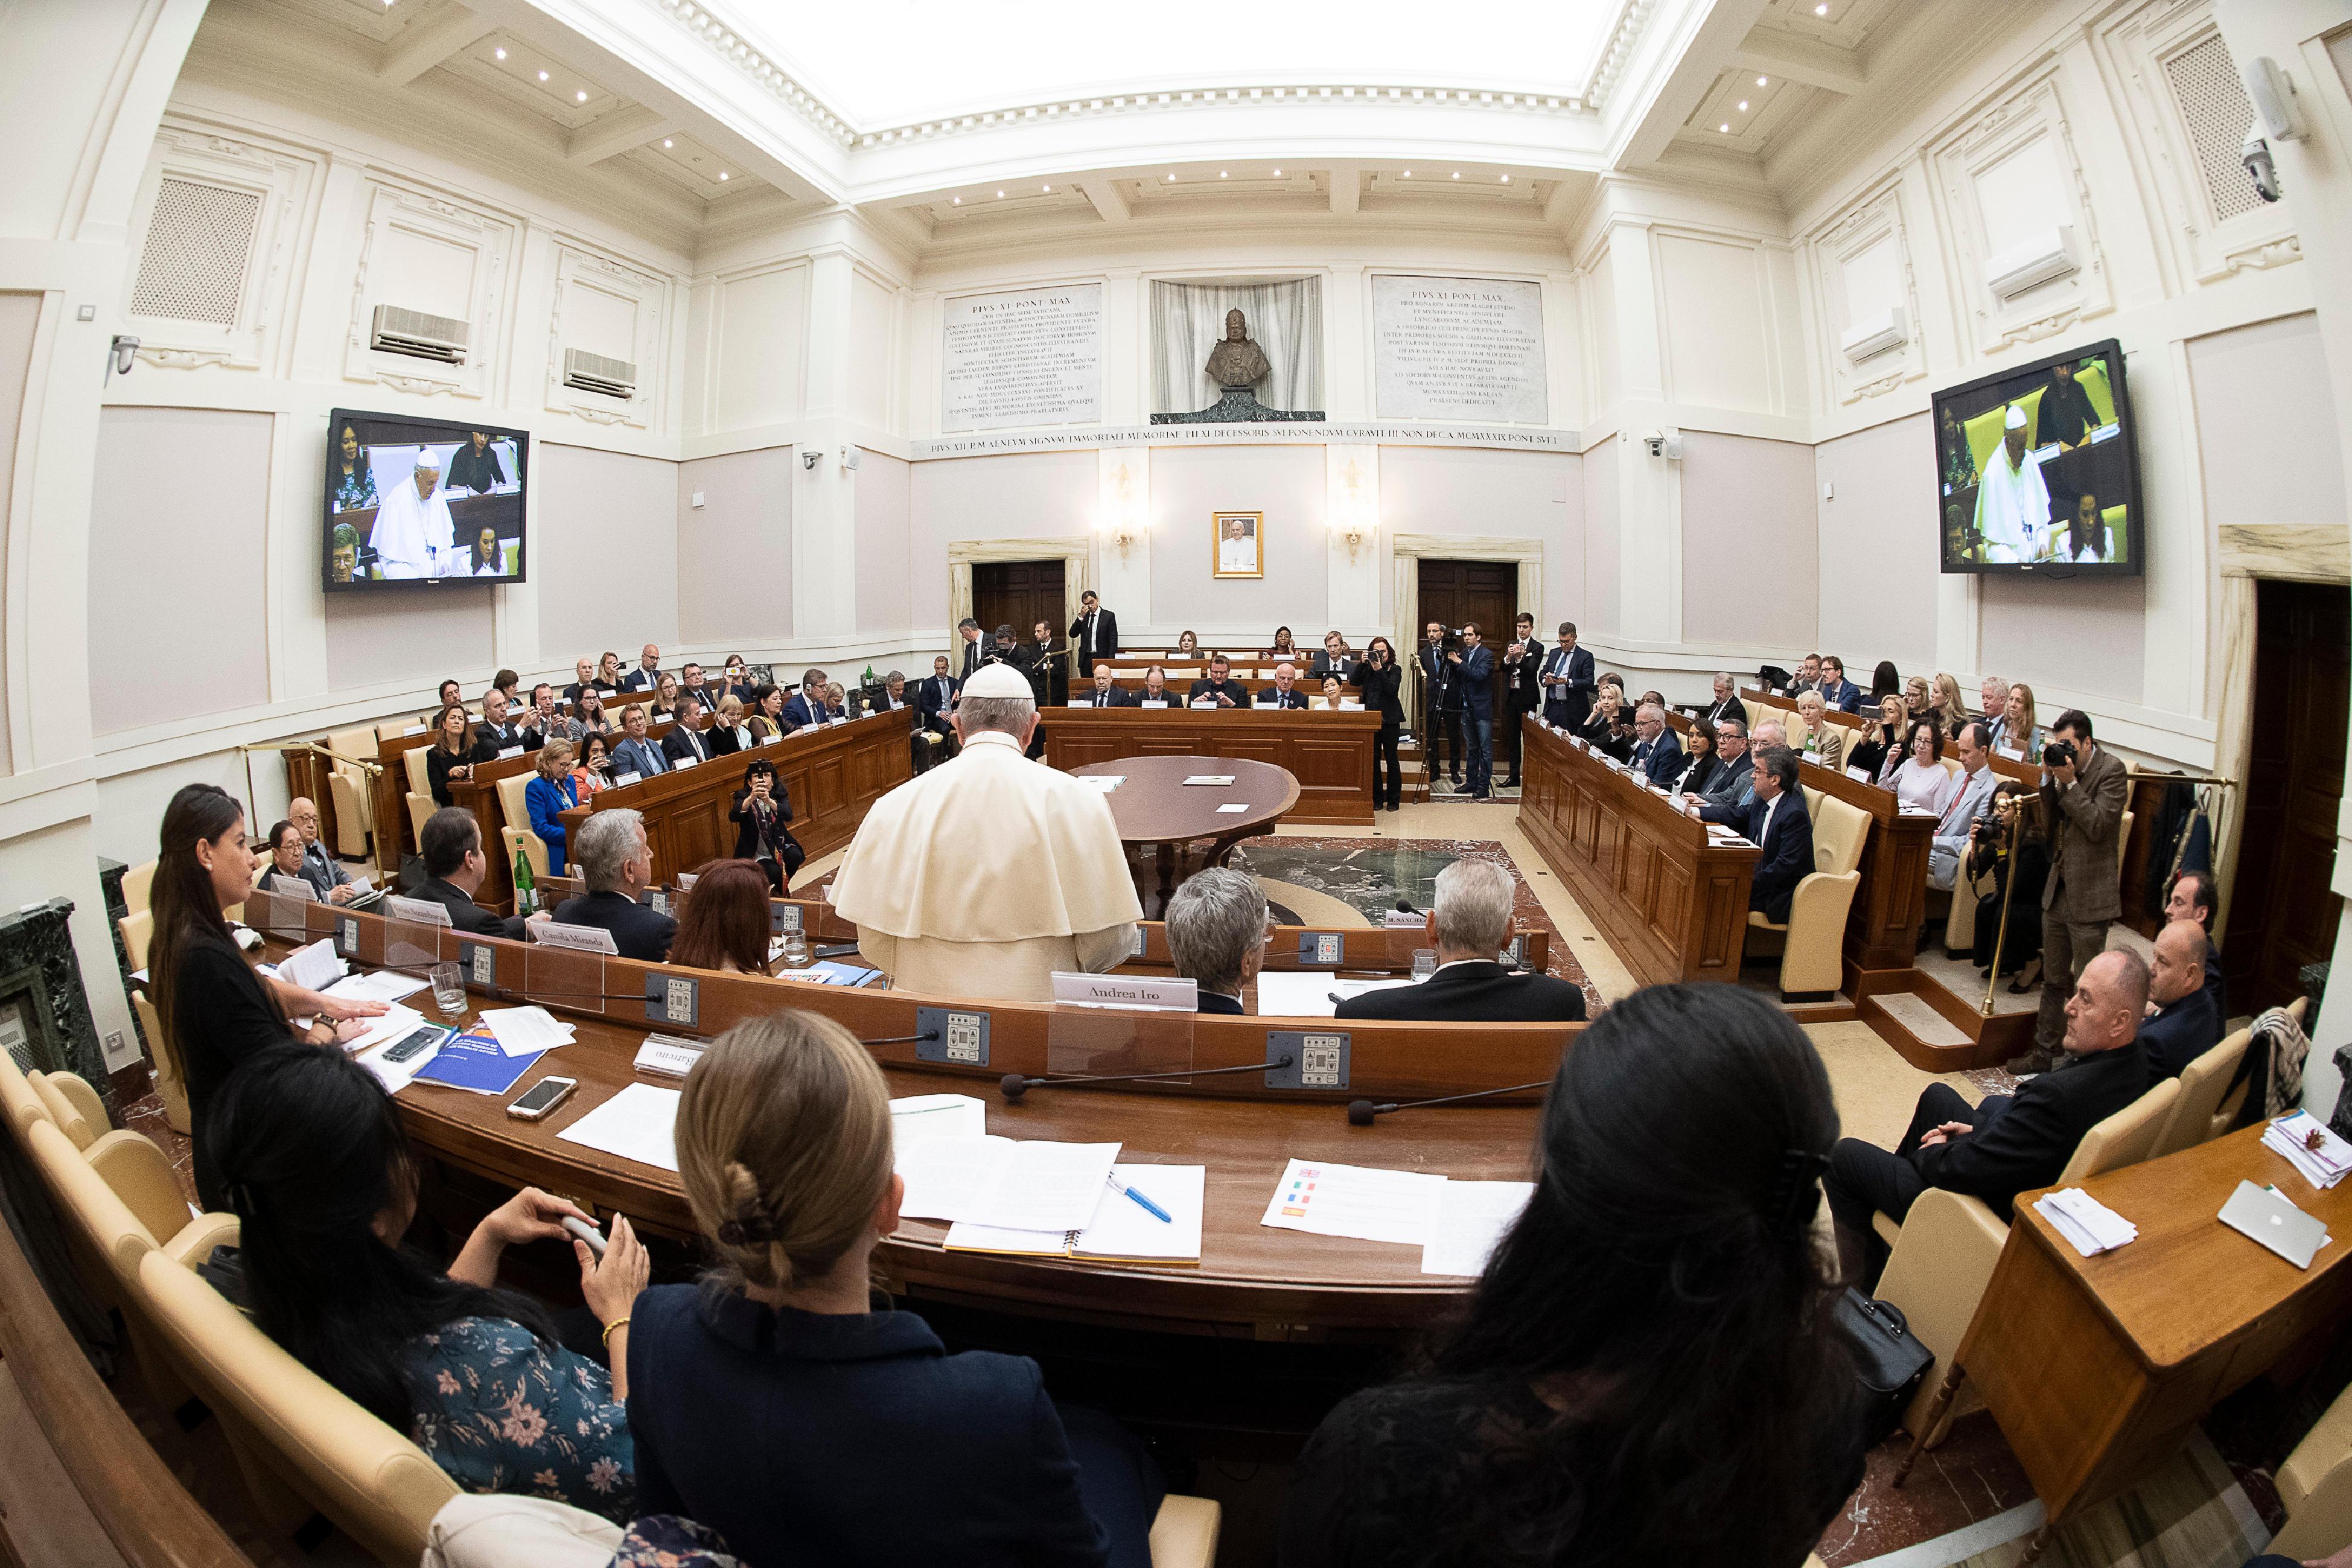 Académie des sciences sociales © Vatican Media